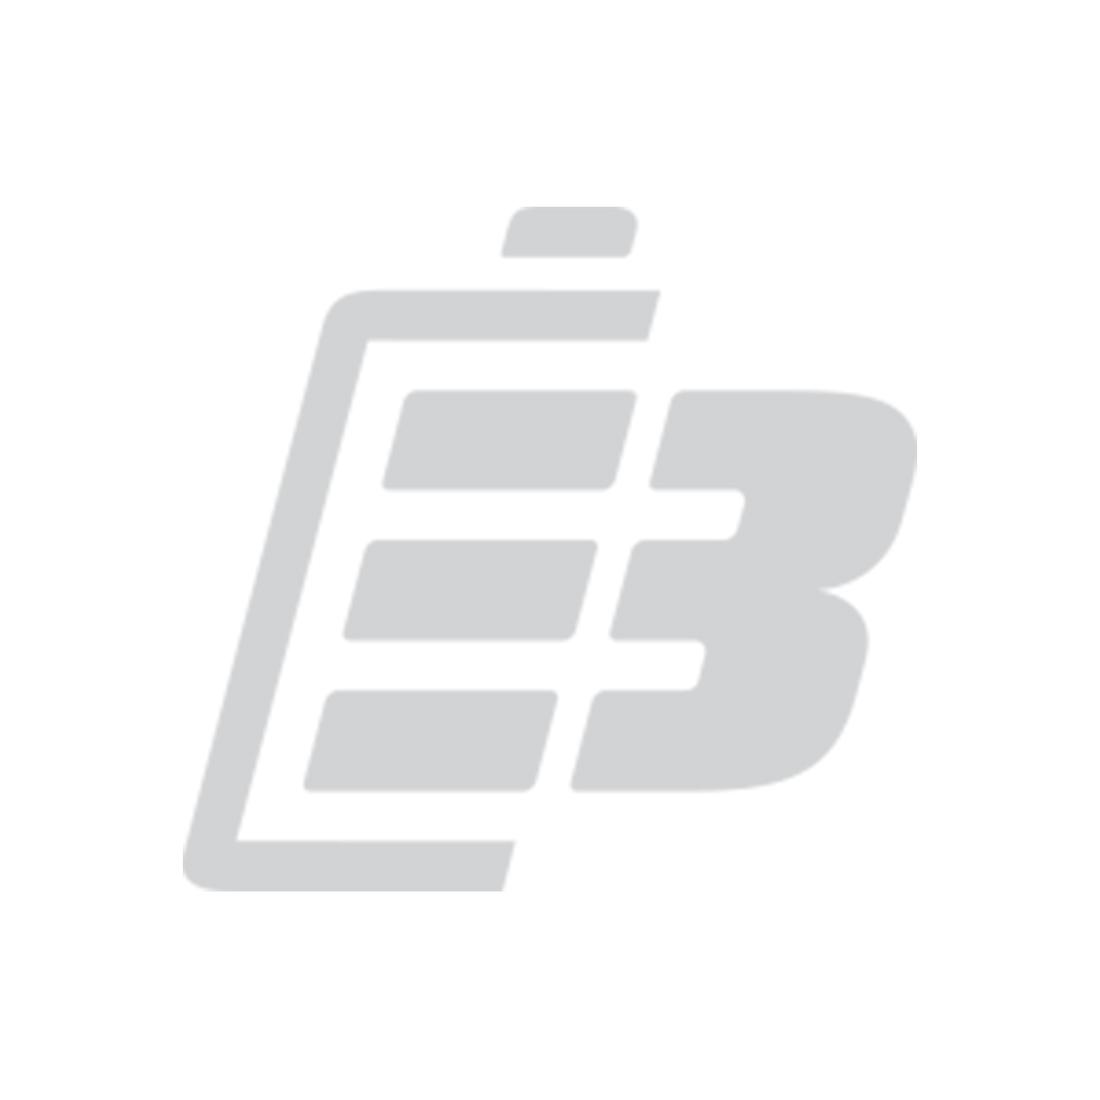 Remote control battery Harman Kardon TC30_1